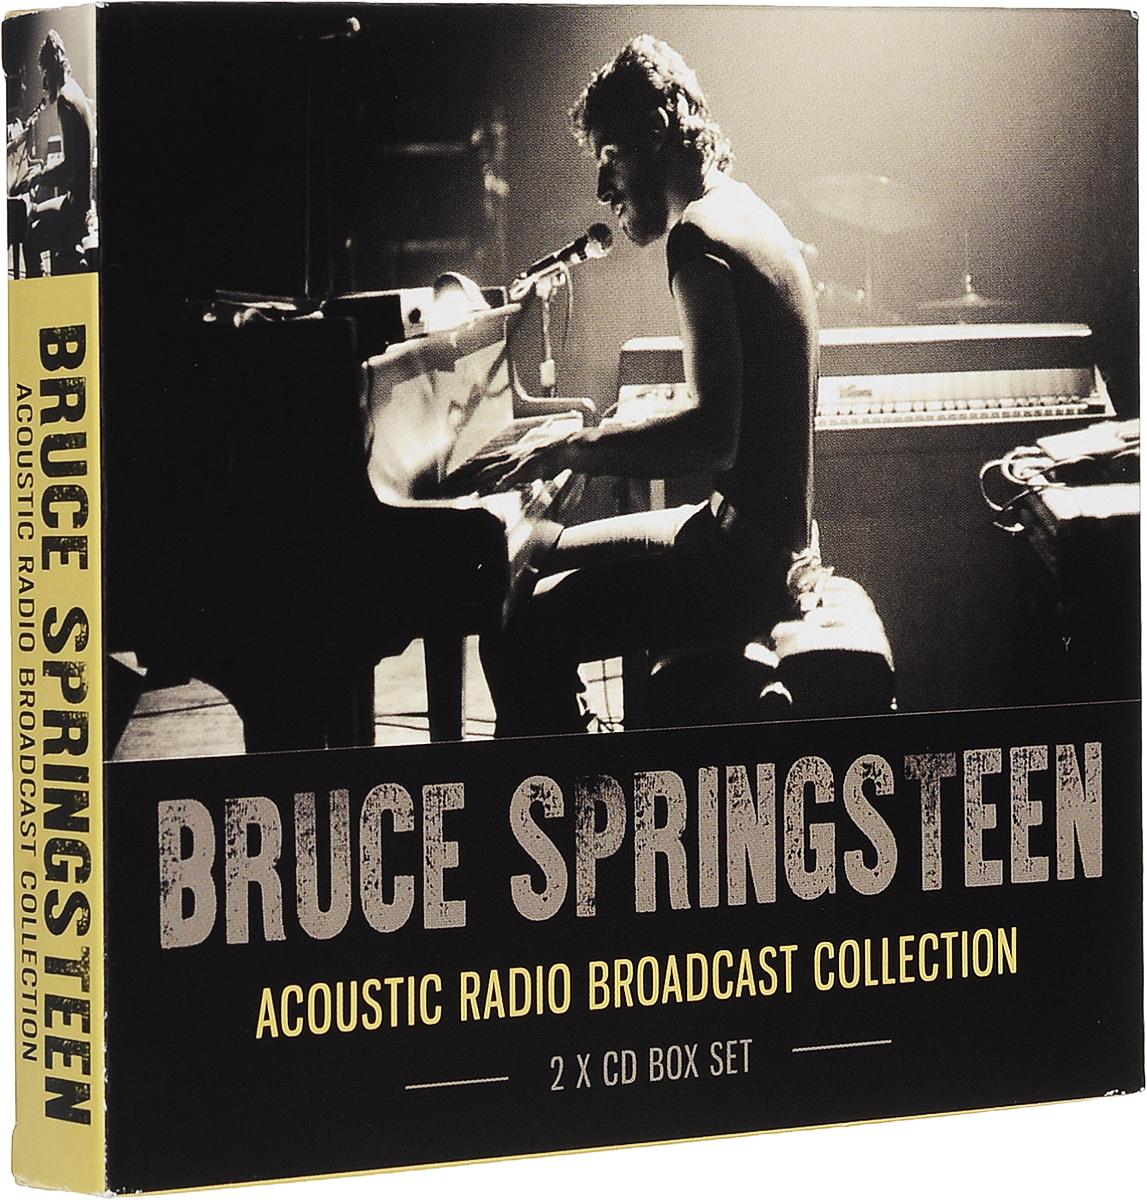 Брюс Спрингстин Bruce Springsteen. Acoustic Radio Broadcast Collection (2 CD) брюс спрингстин bruce springsteen passaic night 1978 the classic new jersey broadcast volume two 2 lp